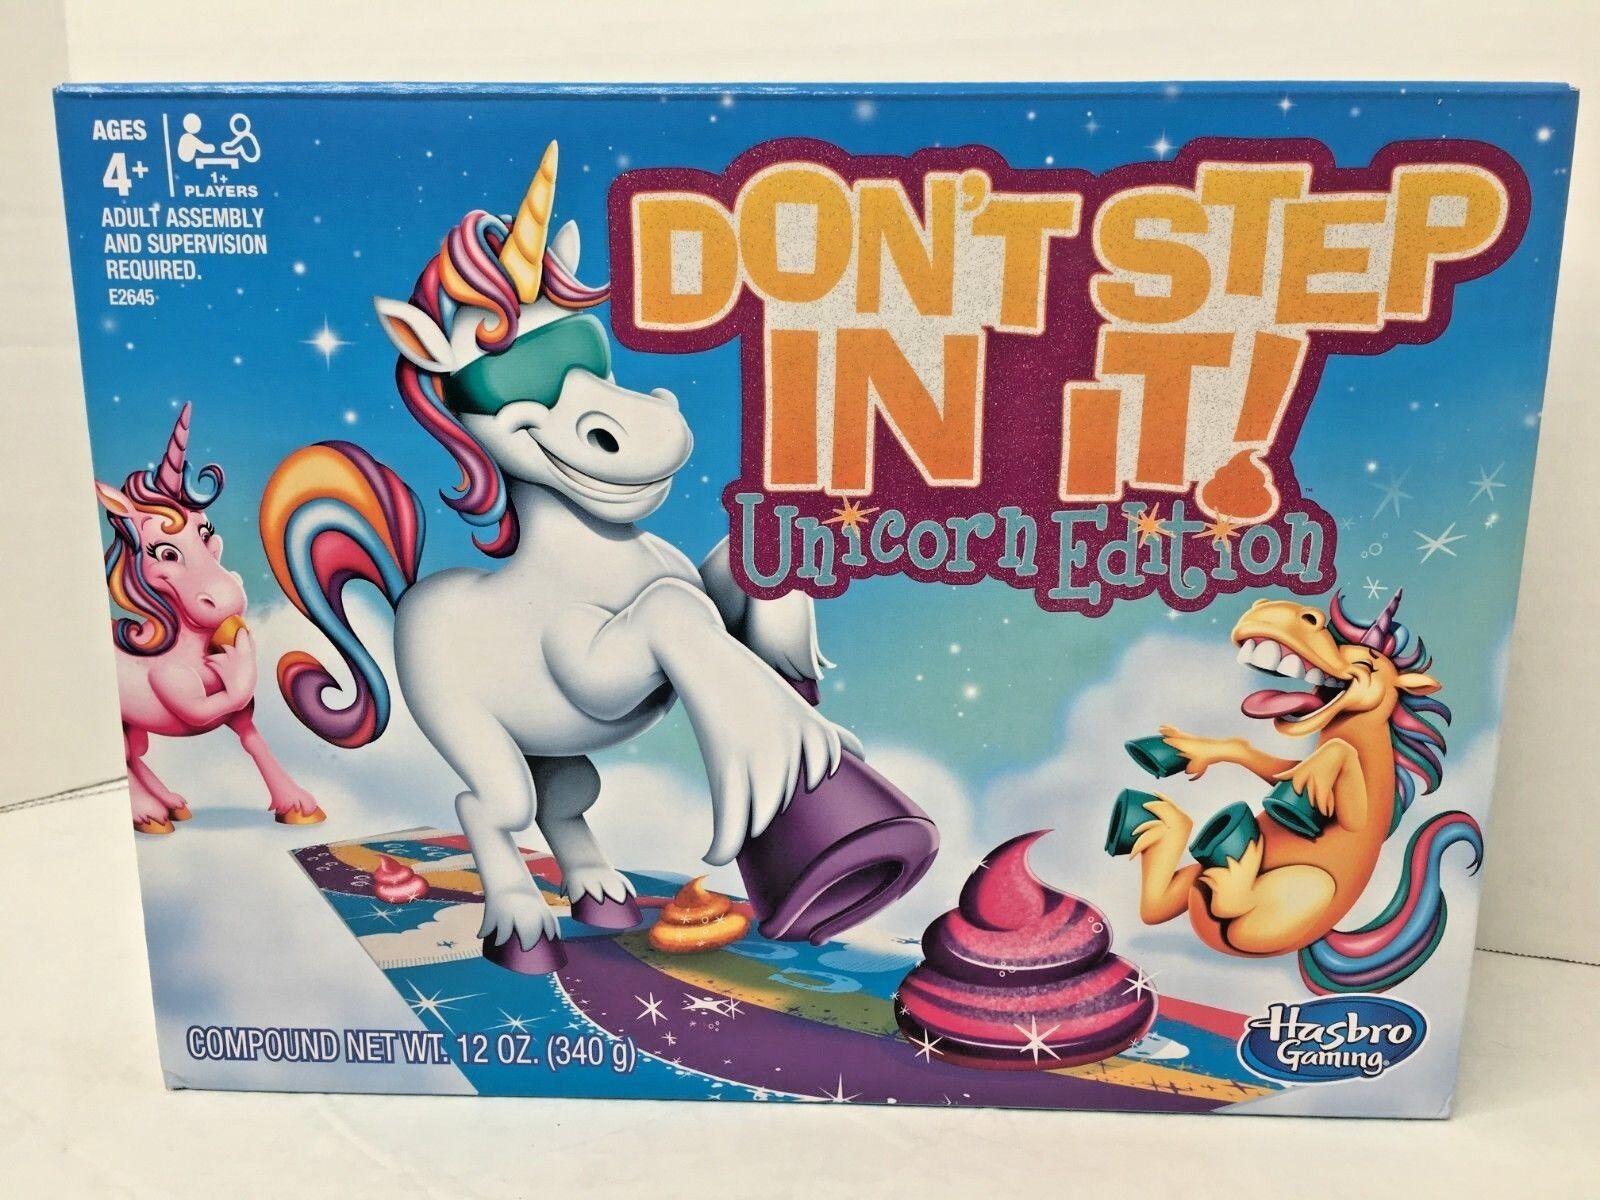 Don T Step In It Unicorn Edition Rainbow Poop Brand New Hasbro Board Game Ebay